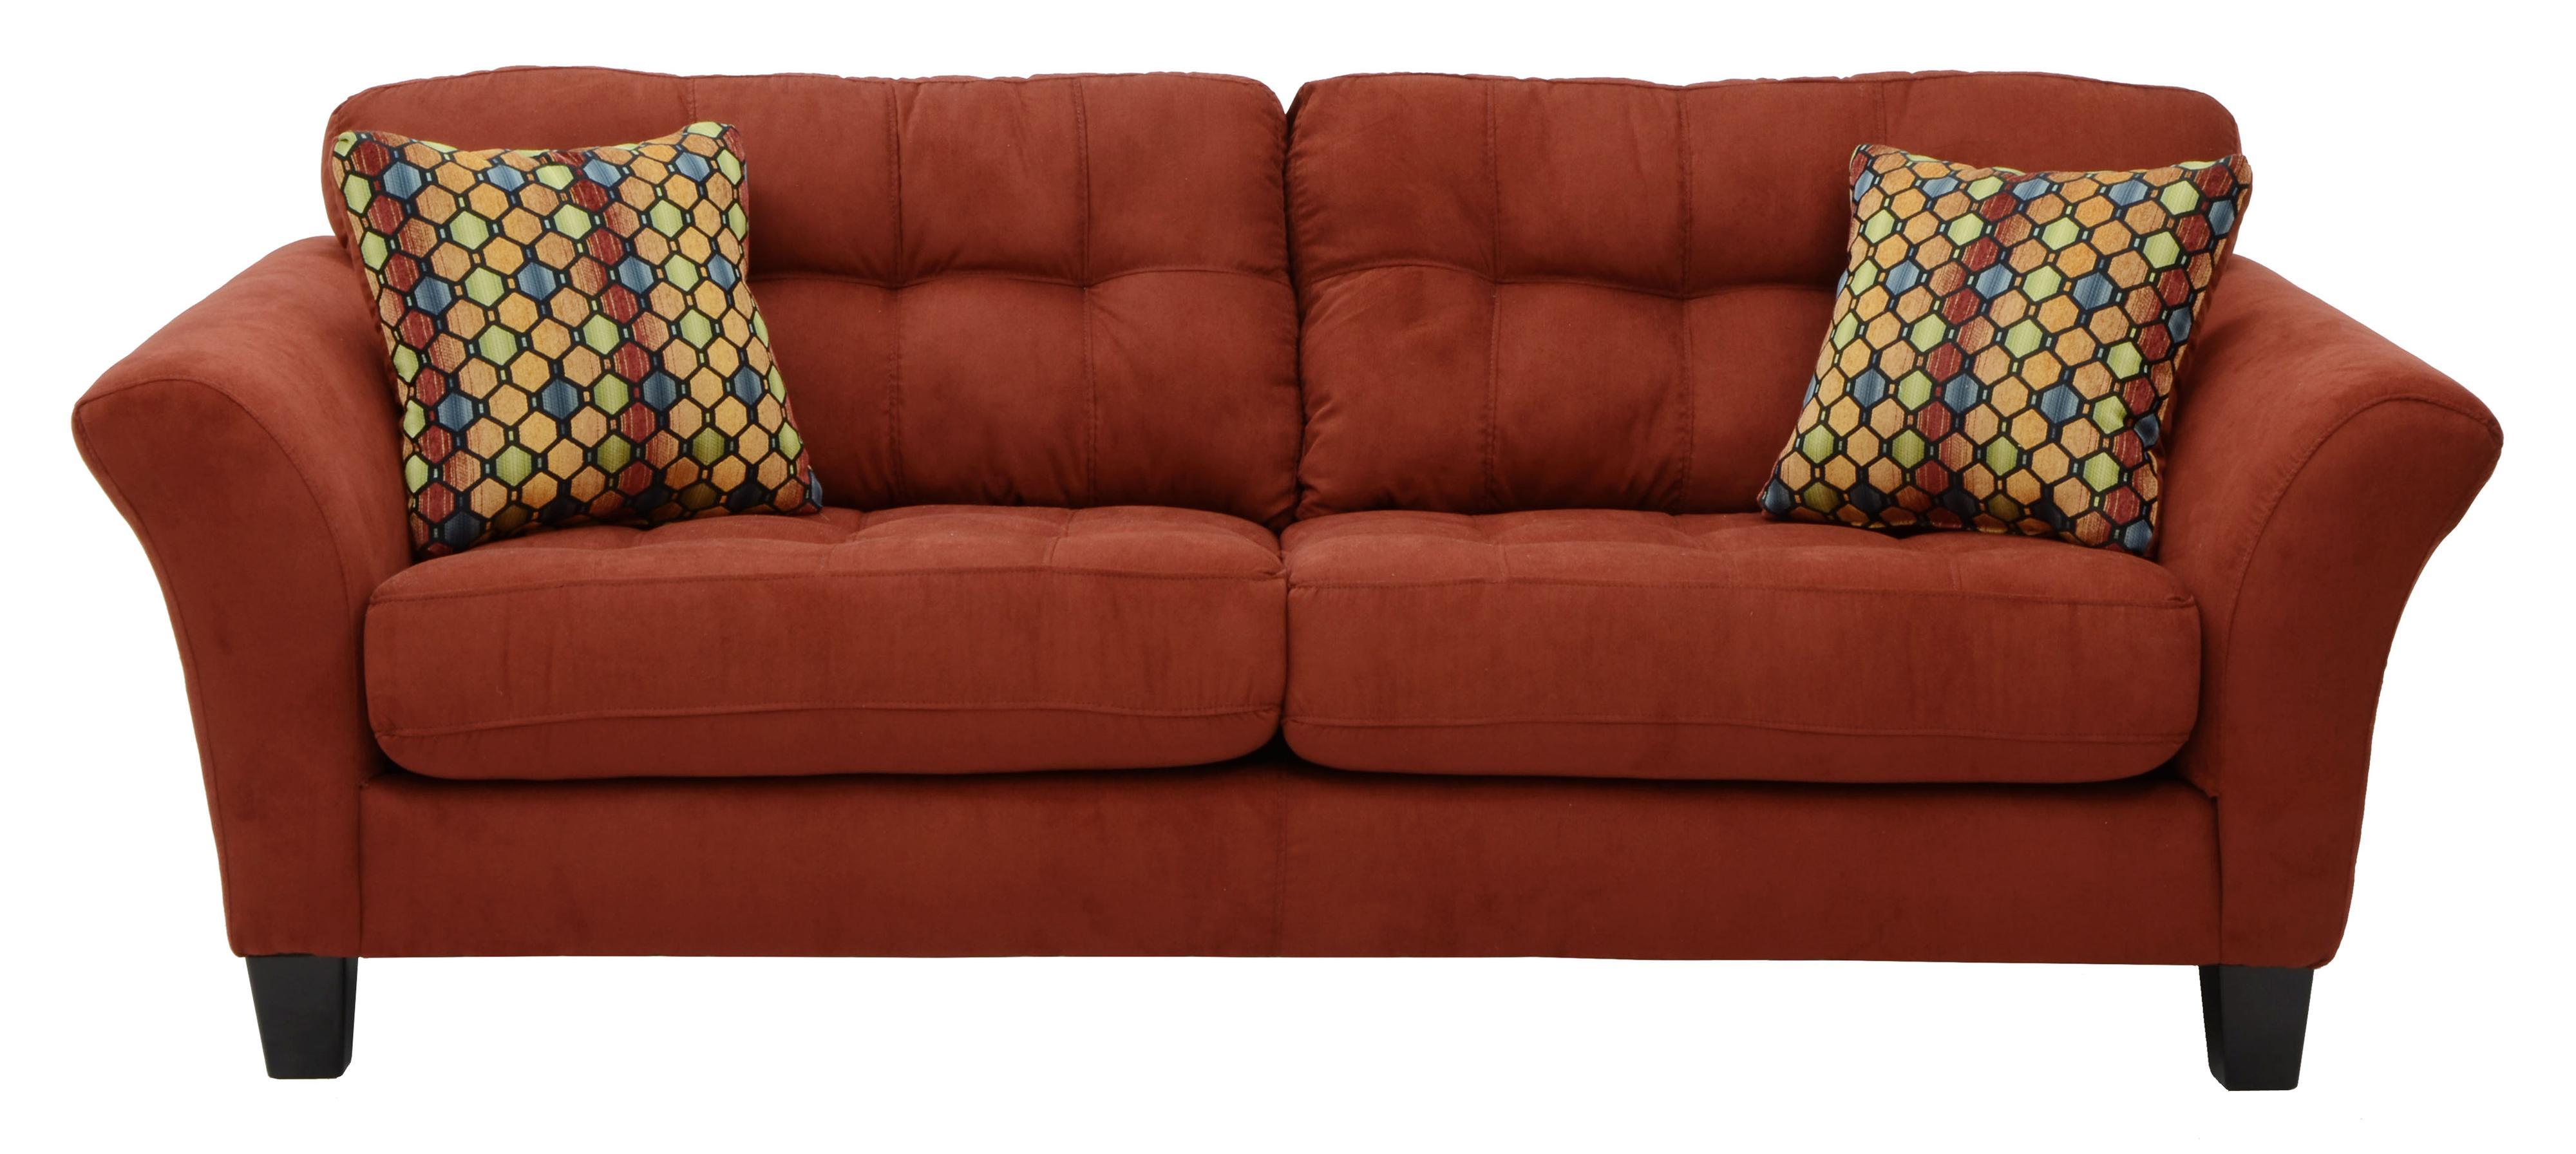 2 cushion sofa 2 cushion sofa elegant hickory white. Black Bedroom Furniture Sets. Home Design Ideas